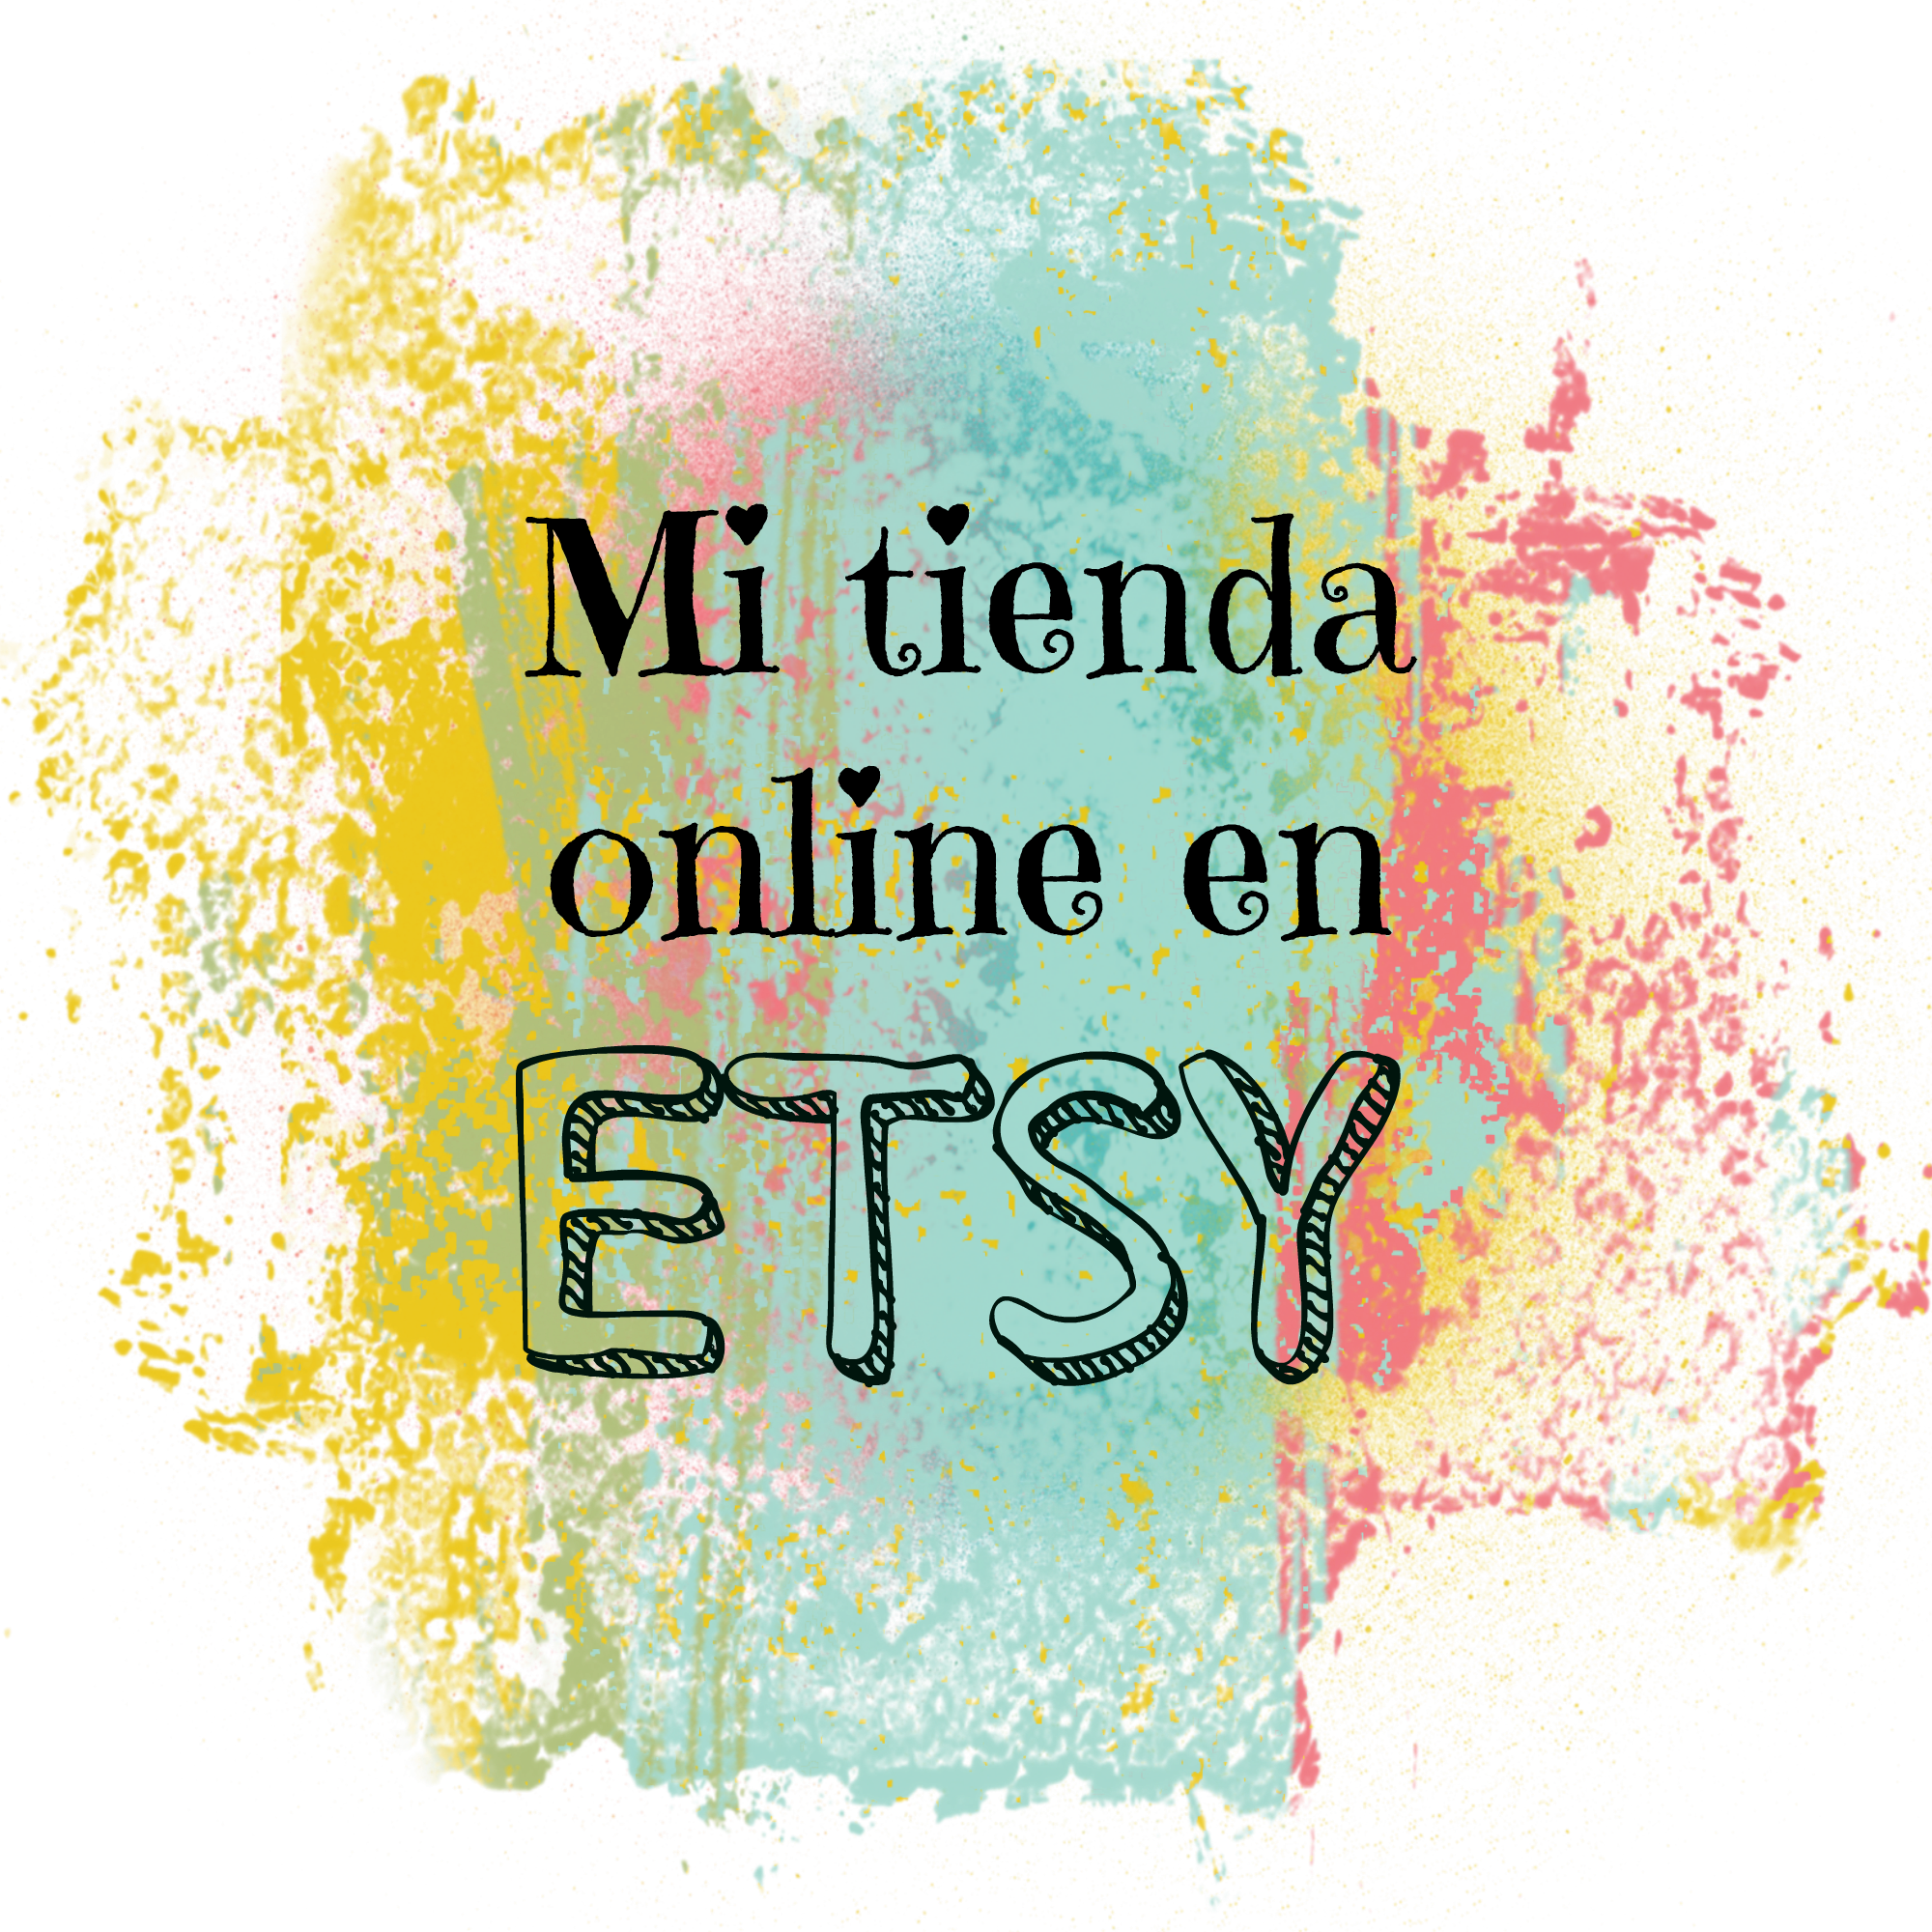 etsy tienda